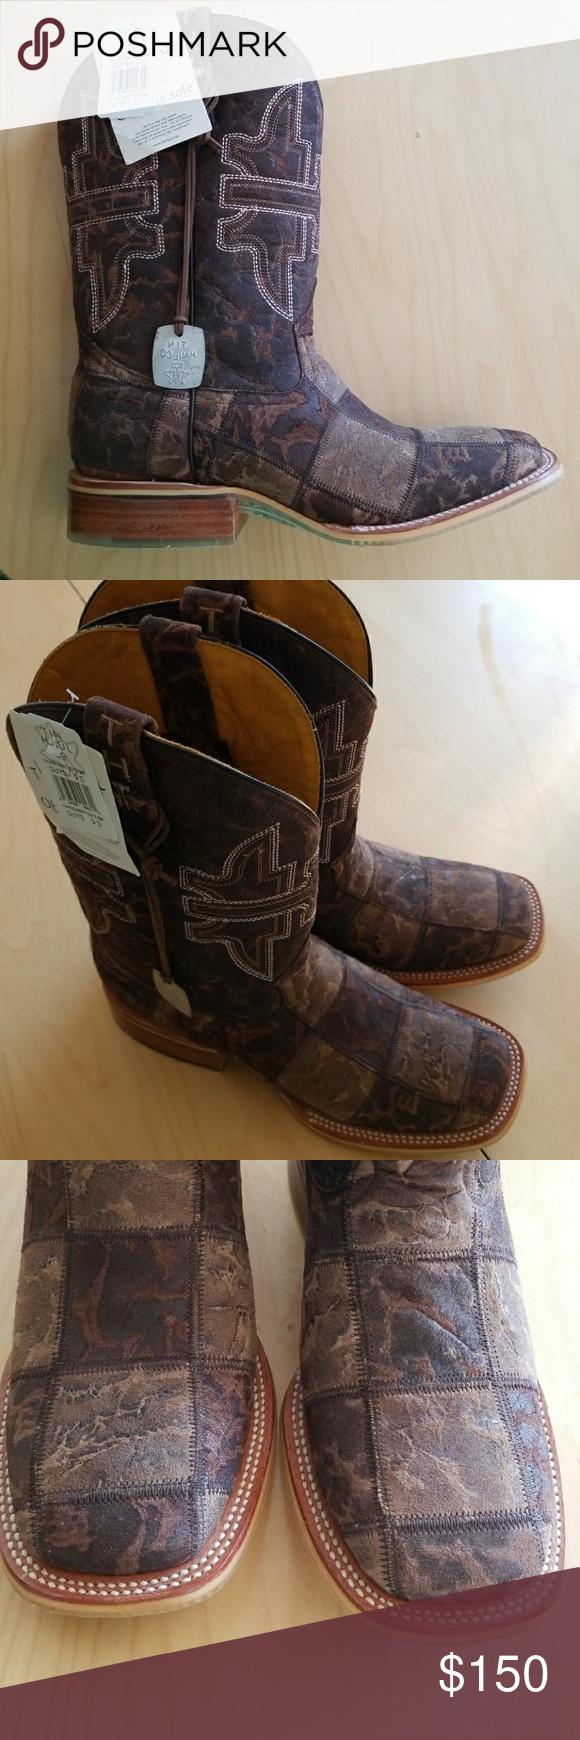 07d11525b64 MENS Cowboy Boots Tin Haul Co. Million dollar check cowboy boots ...